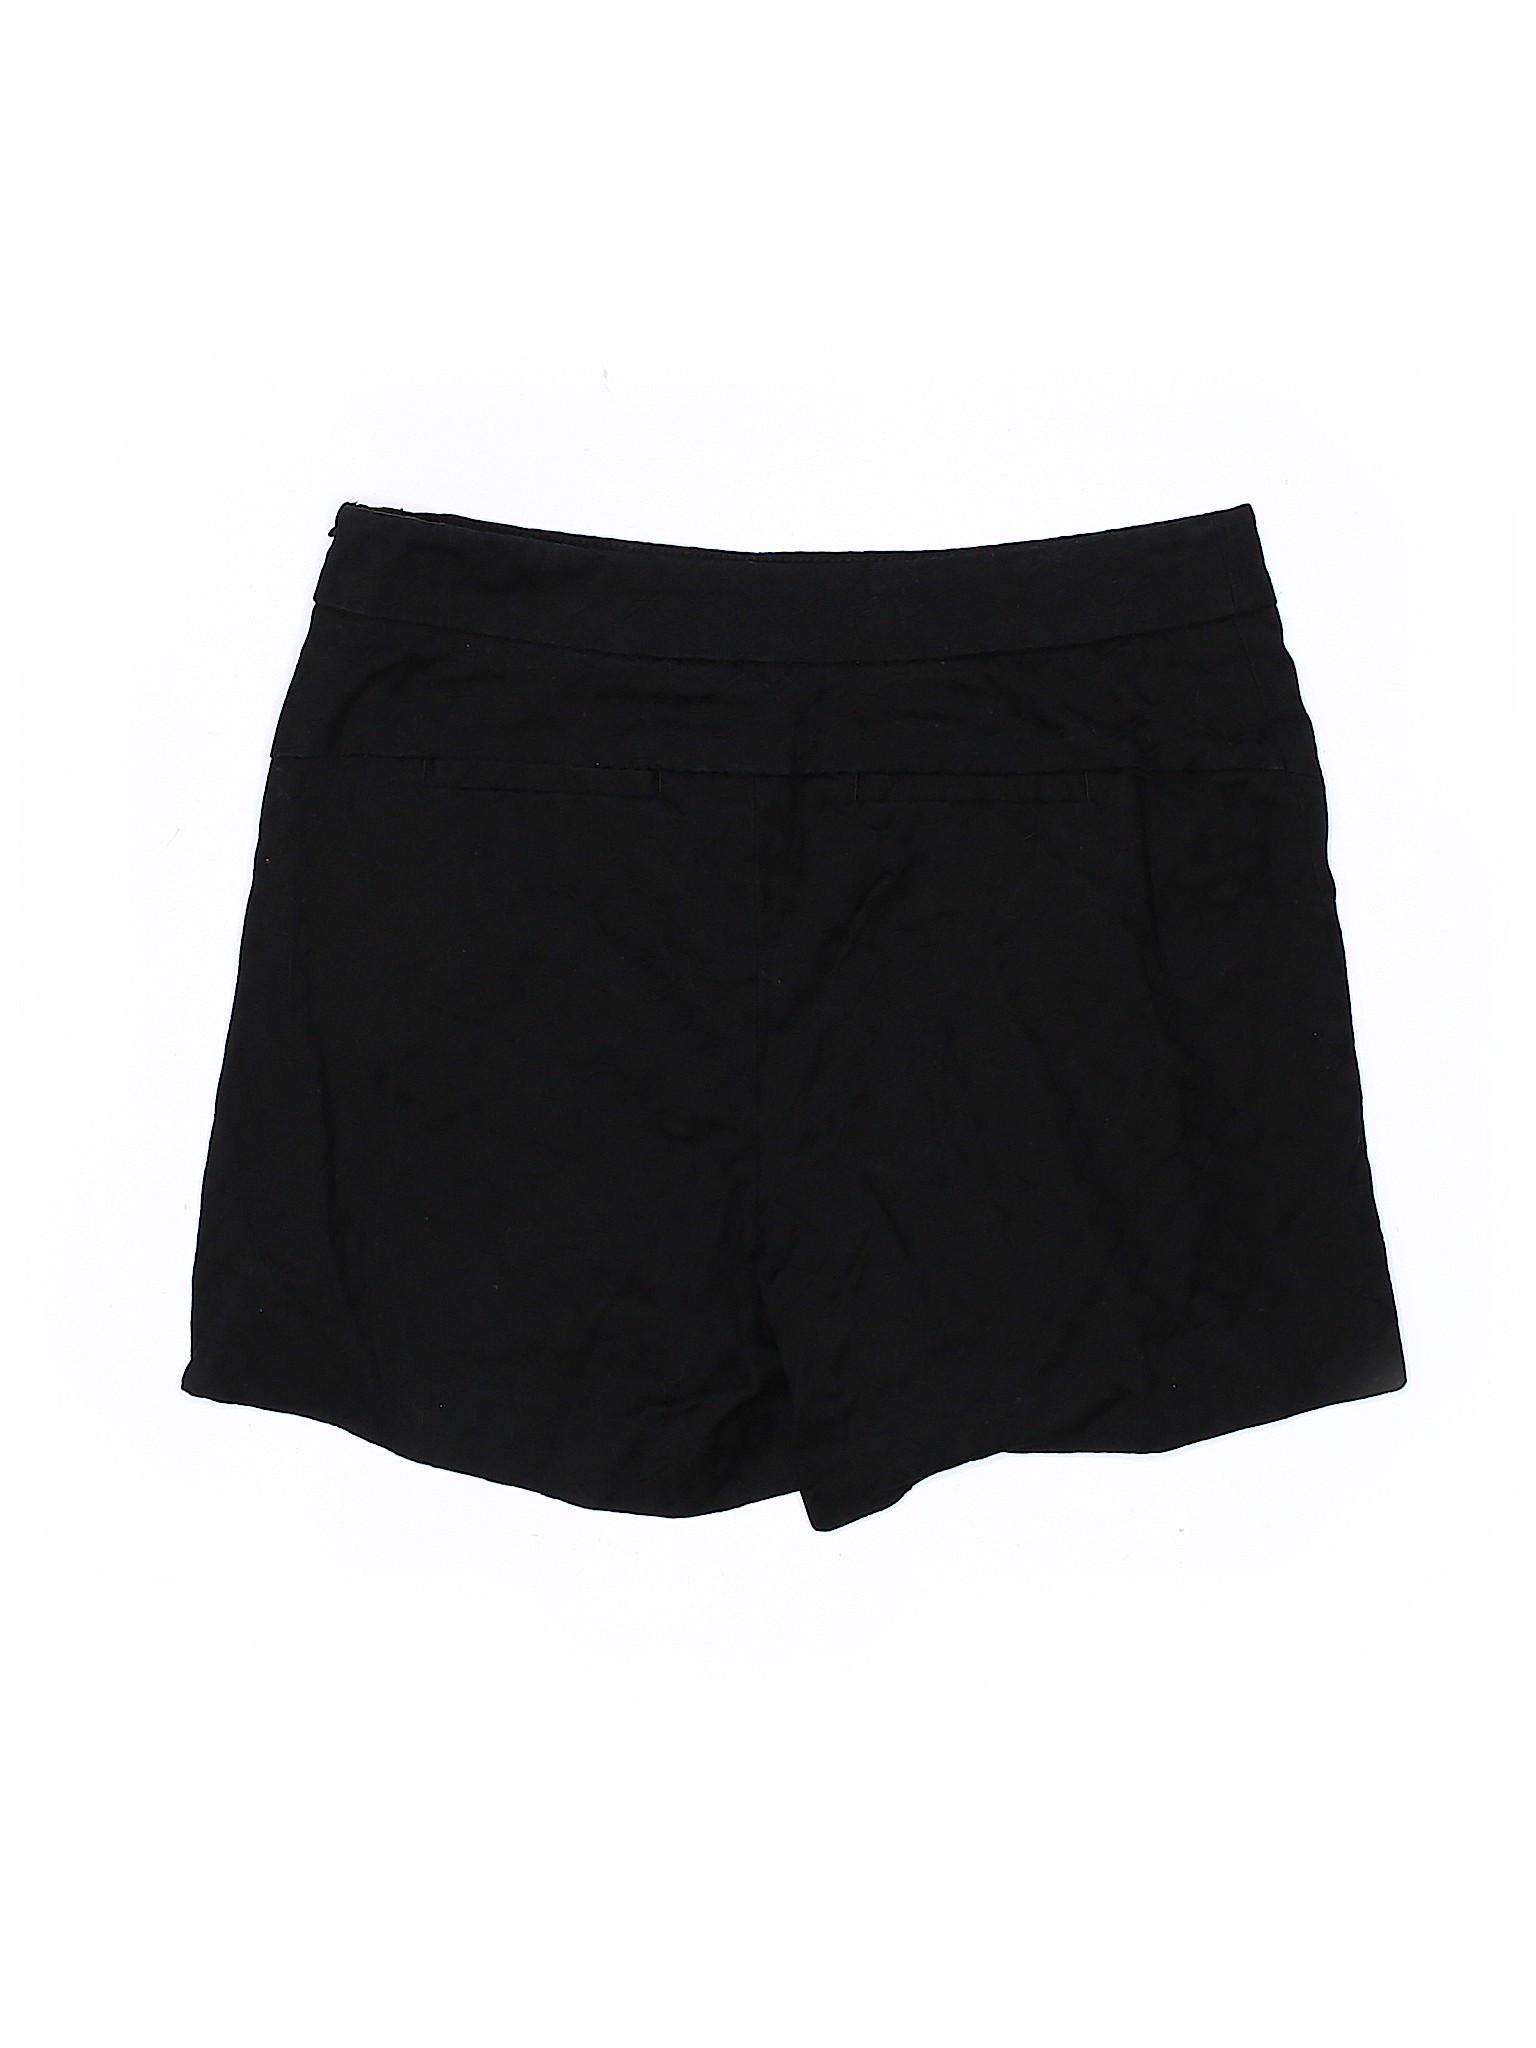 Cartonnier Boutique Boutique Cartonnier Shorts Shorts Shorts Cartonnier Boutique OxFEnXF